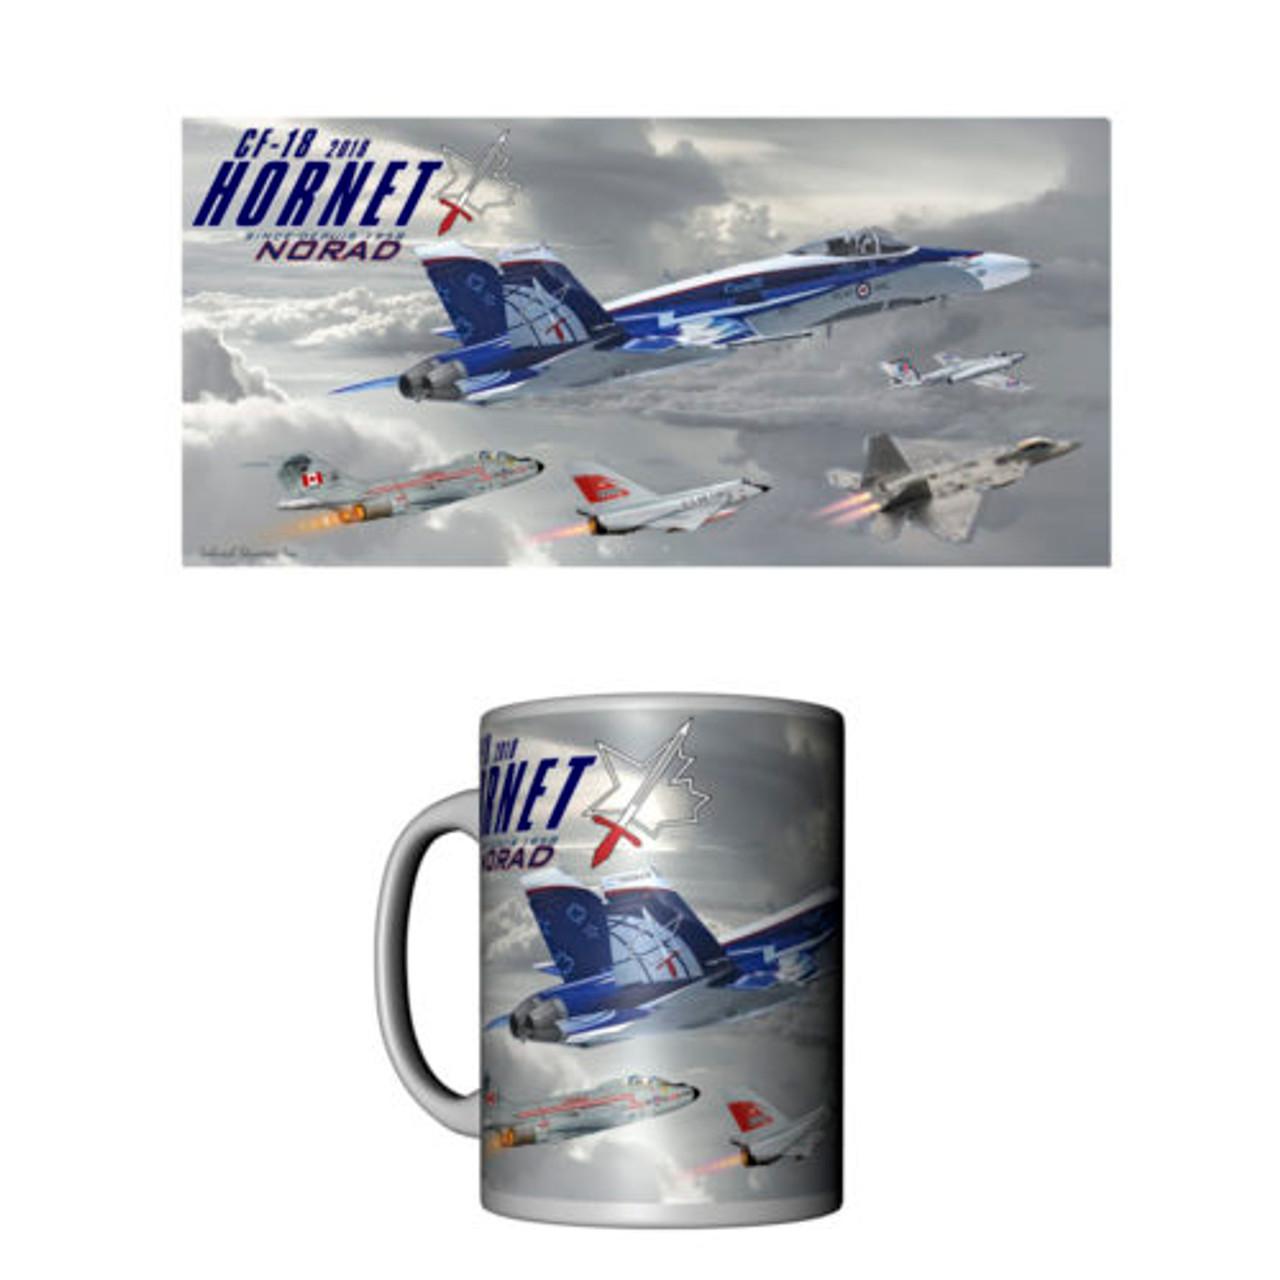 Norad 60th Anniversary CF-18 Hornet Ceramic Mug